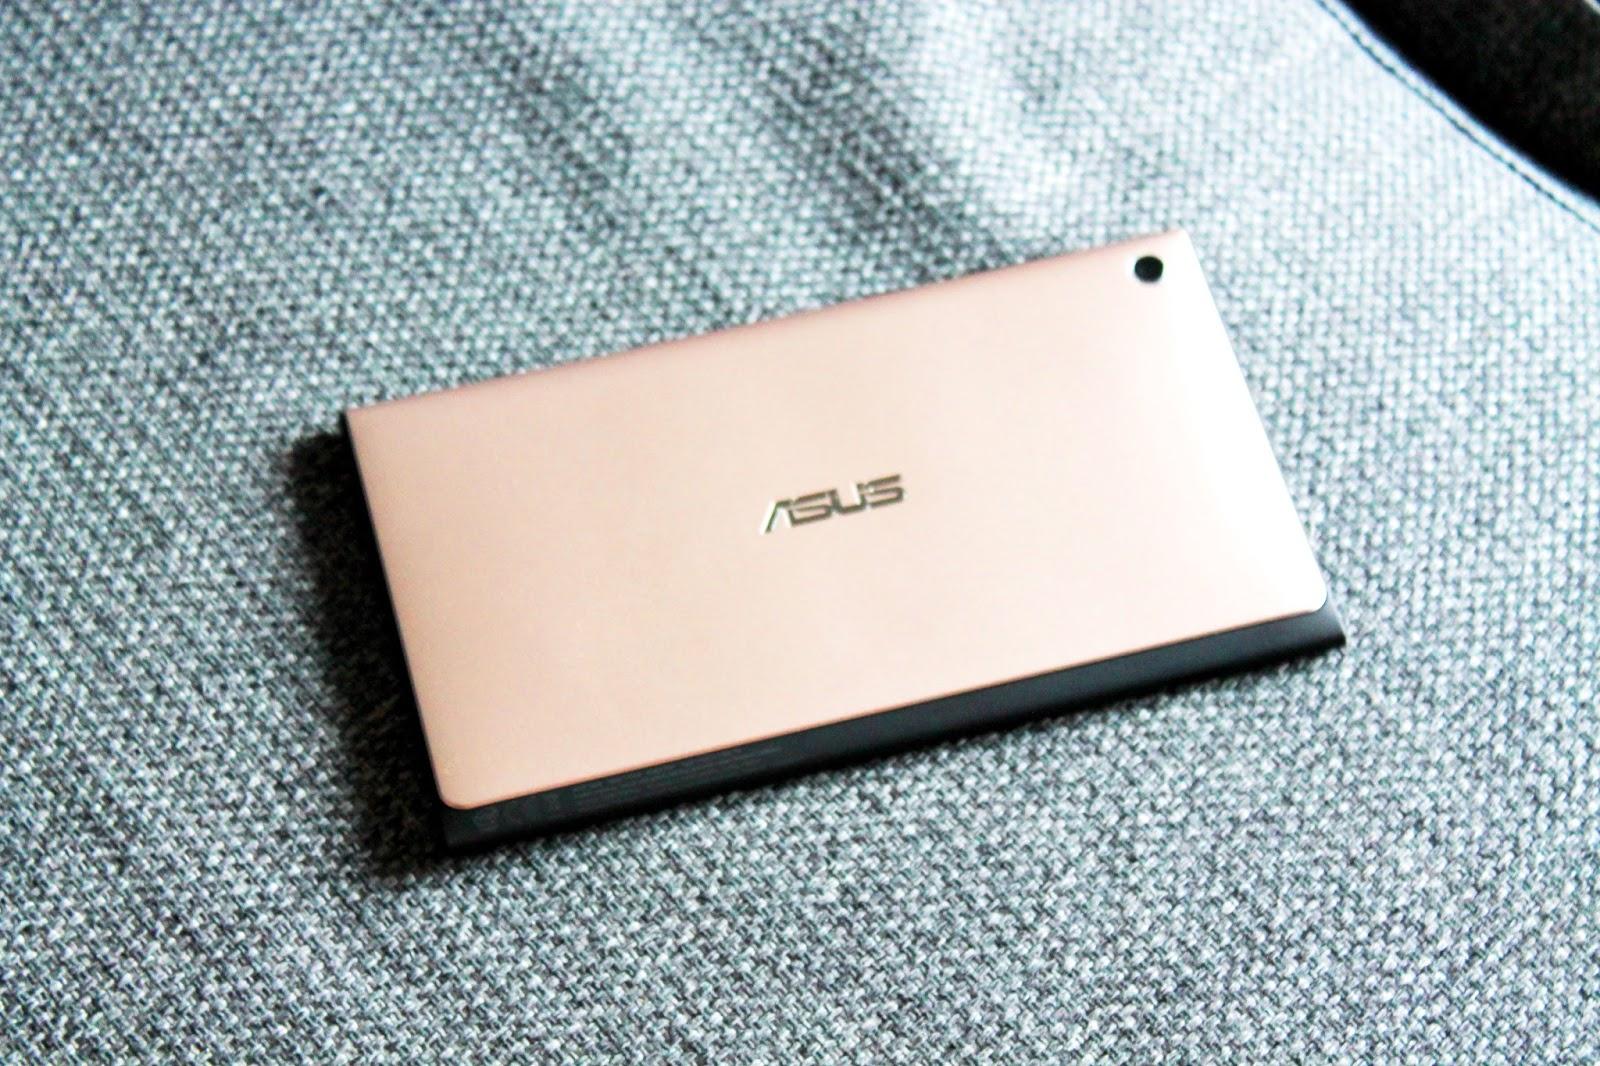 My new Asus Memo Pad 7 tablet | Alinan kotona blog